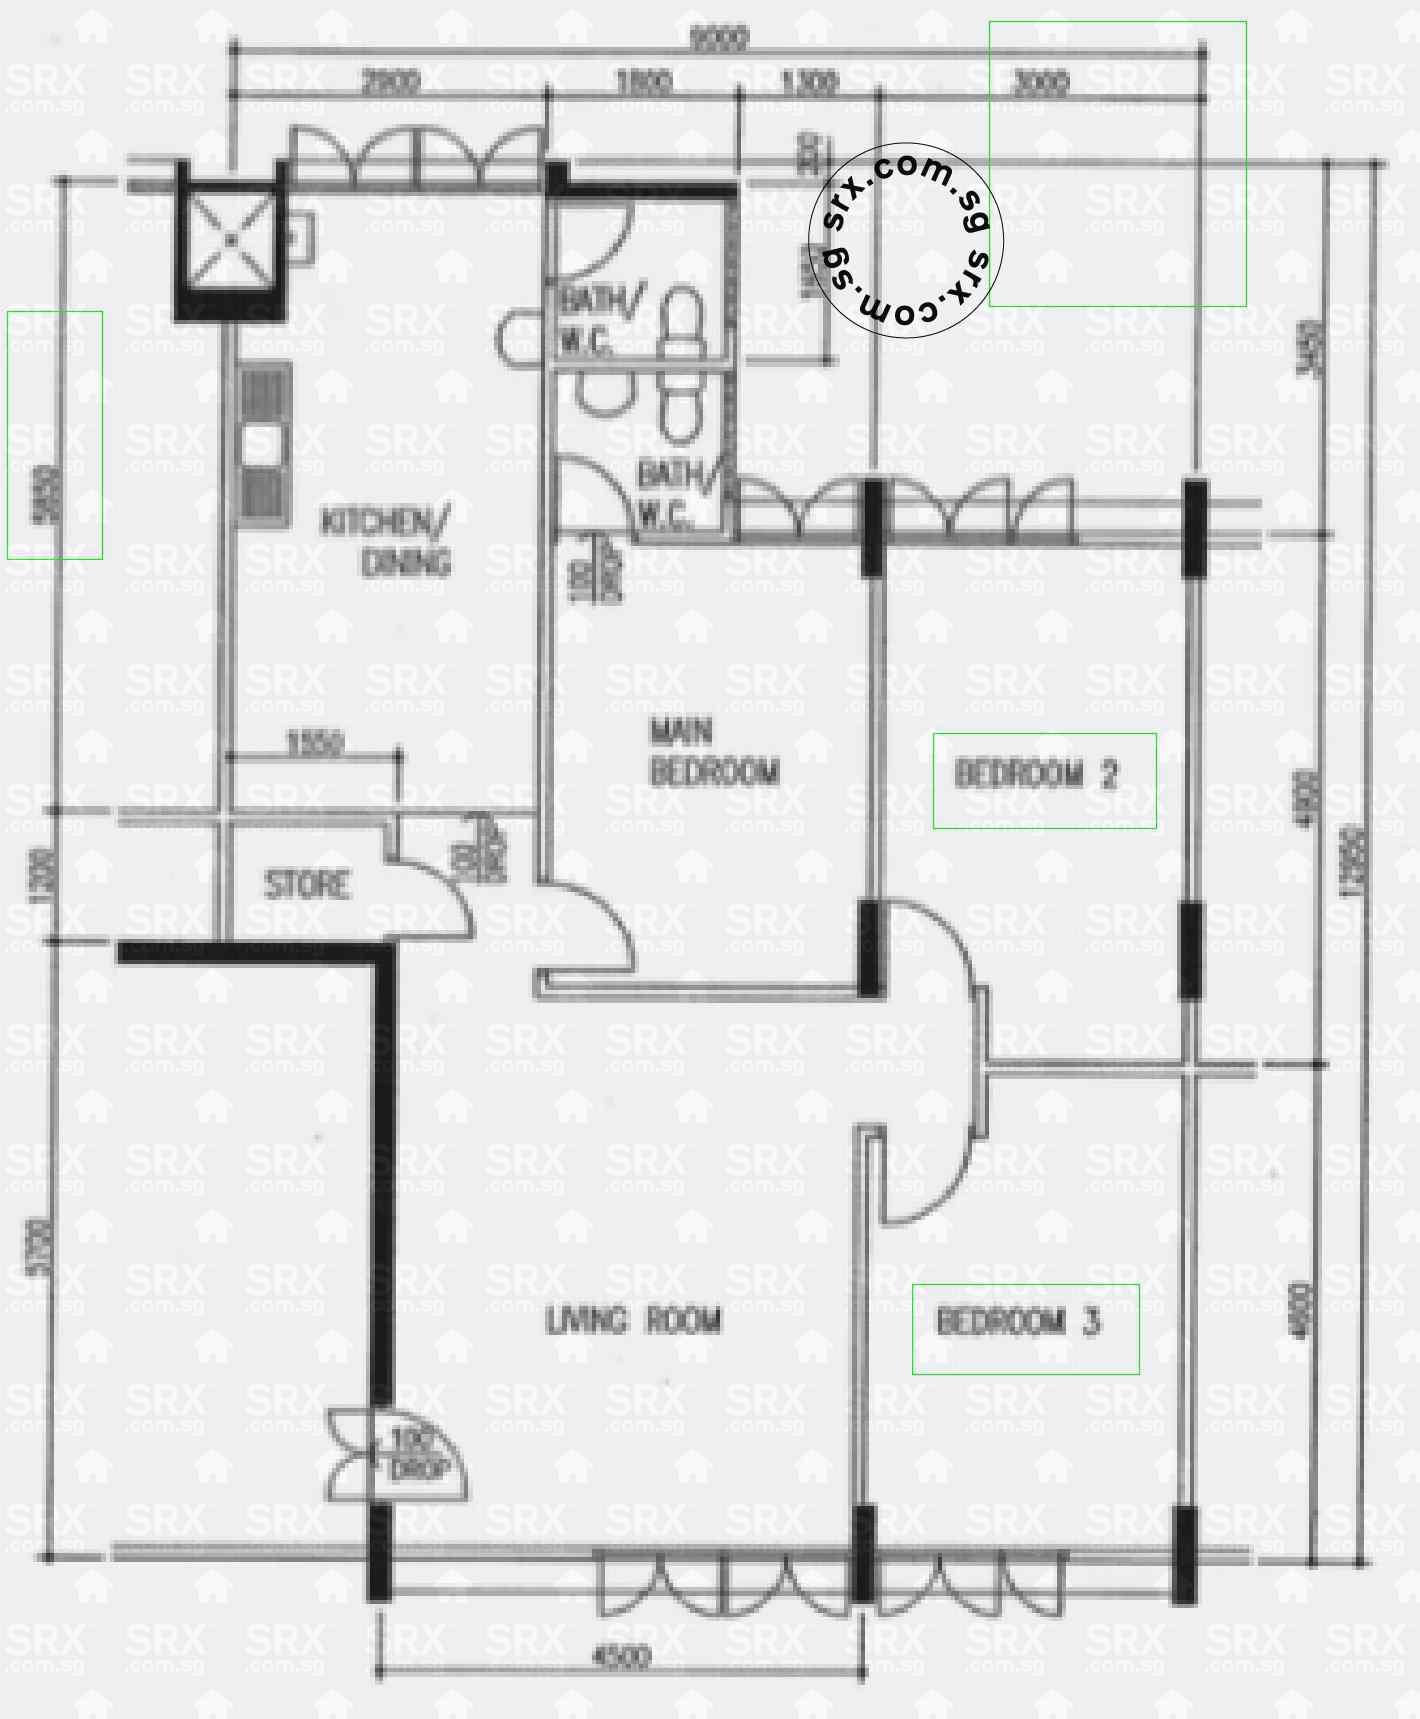 floor plans for hougang avenue 2 hdb details srx property